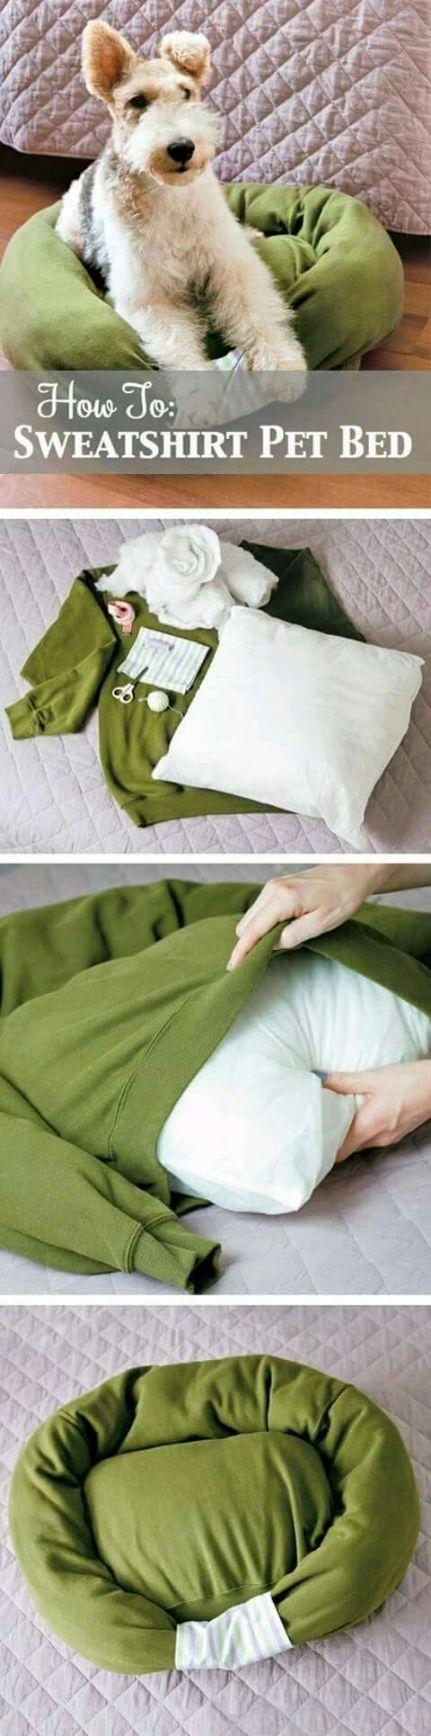 I could use my boyfriend's sweatshirt!  . Upliked by LadyRamirez